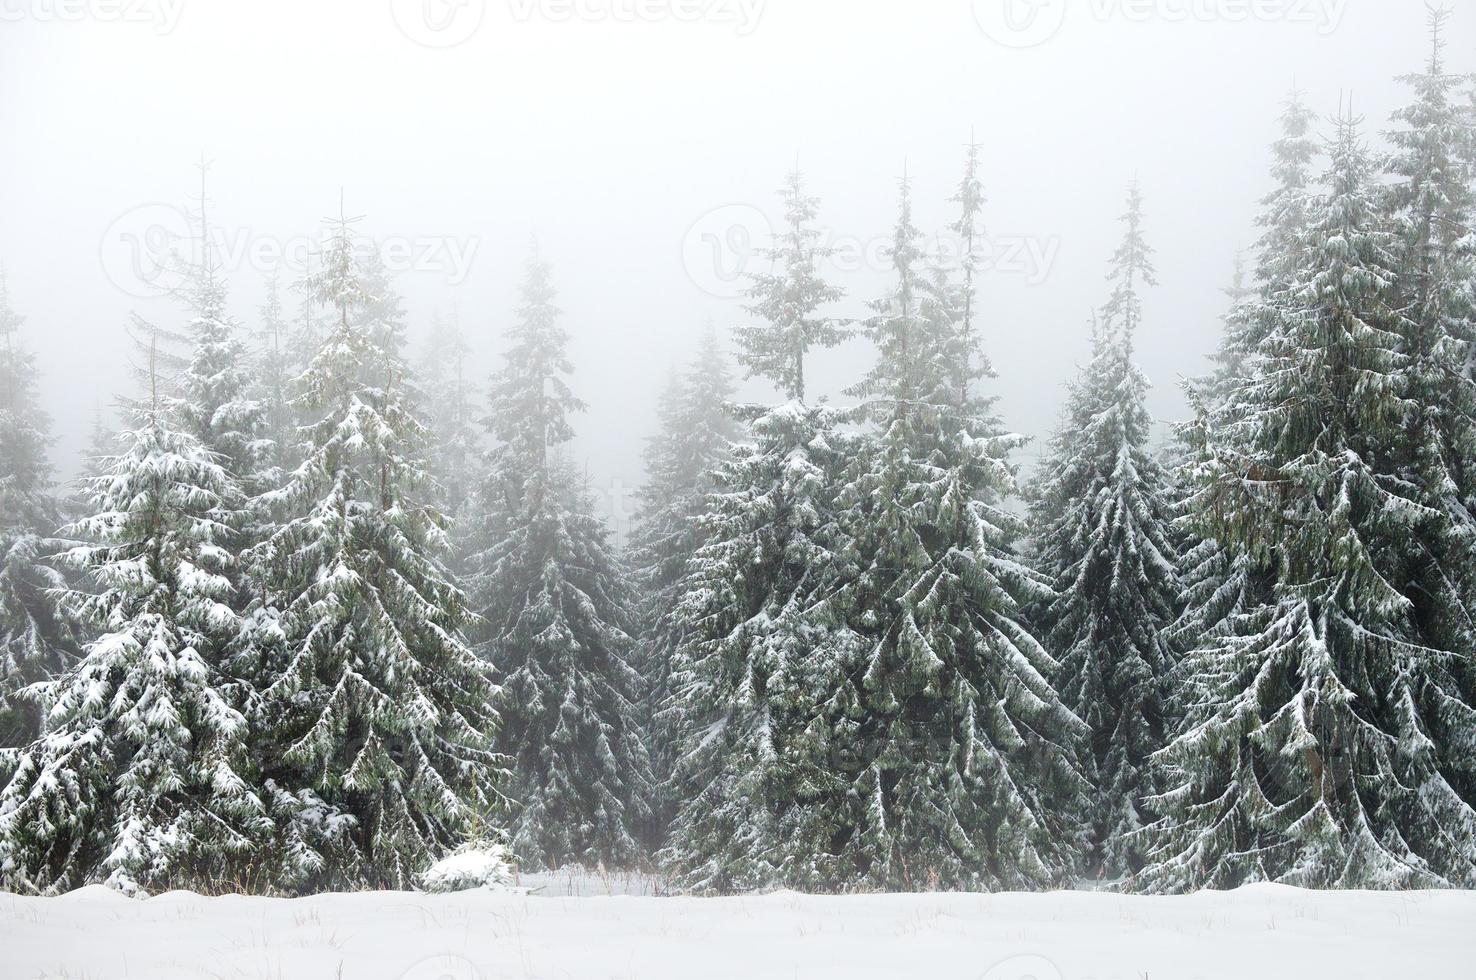 Winterwald im Nebel foto